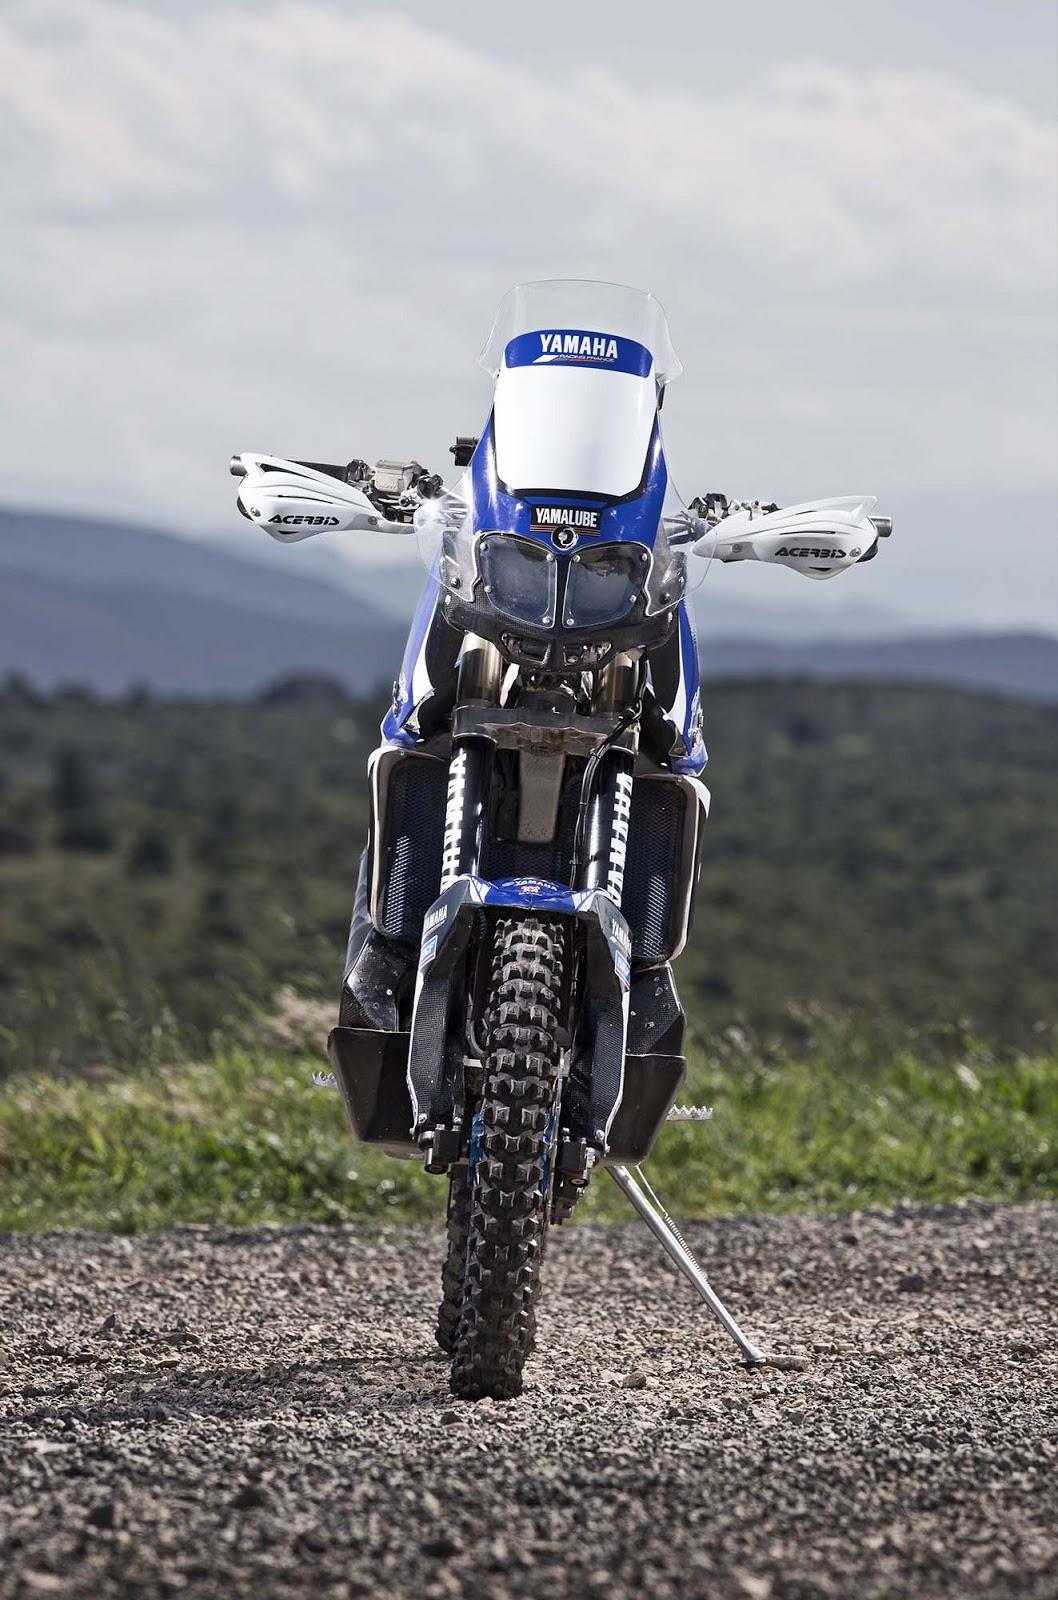 Cyril-Despres-Yamaha-Motor-France-2014-Dakar-Rally-12.jpg